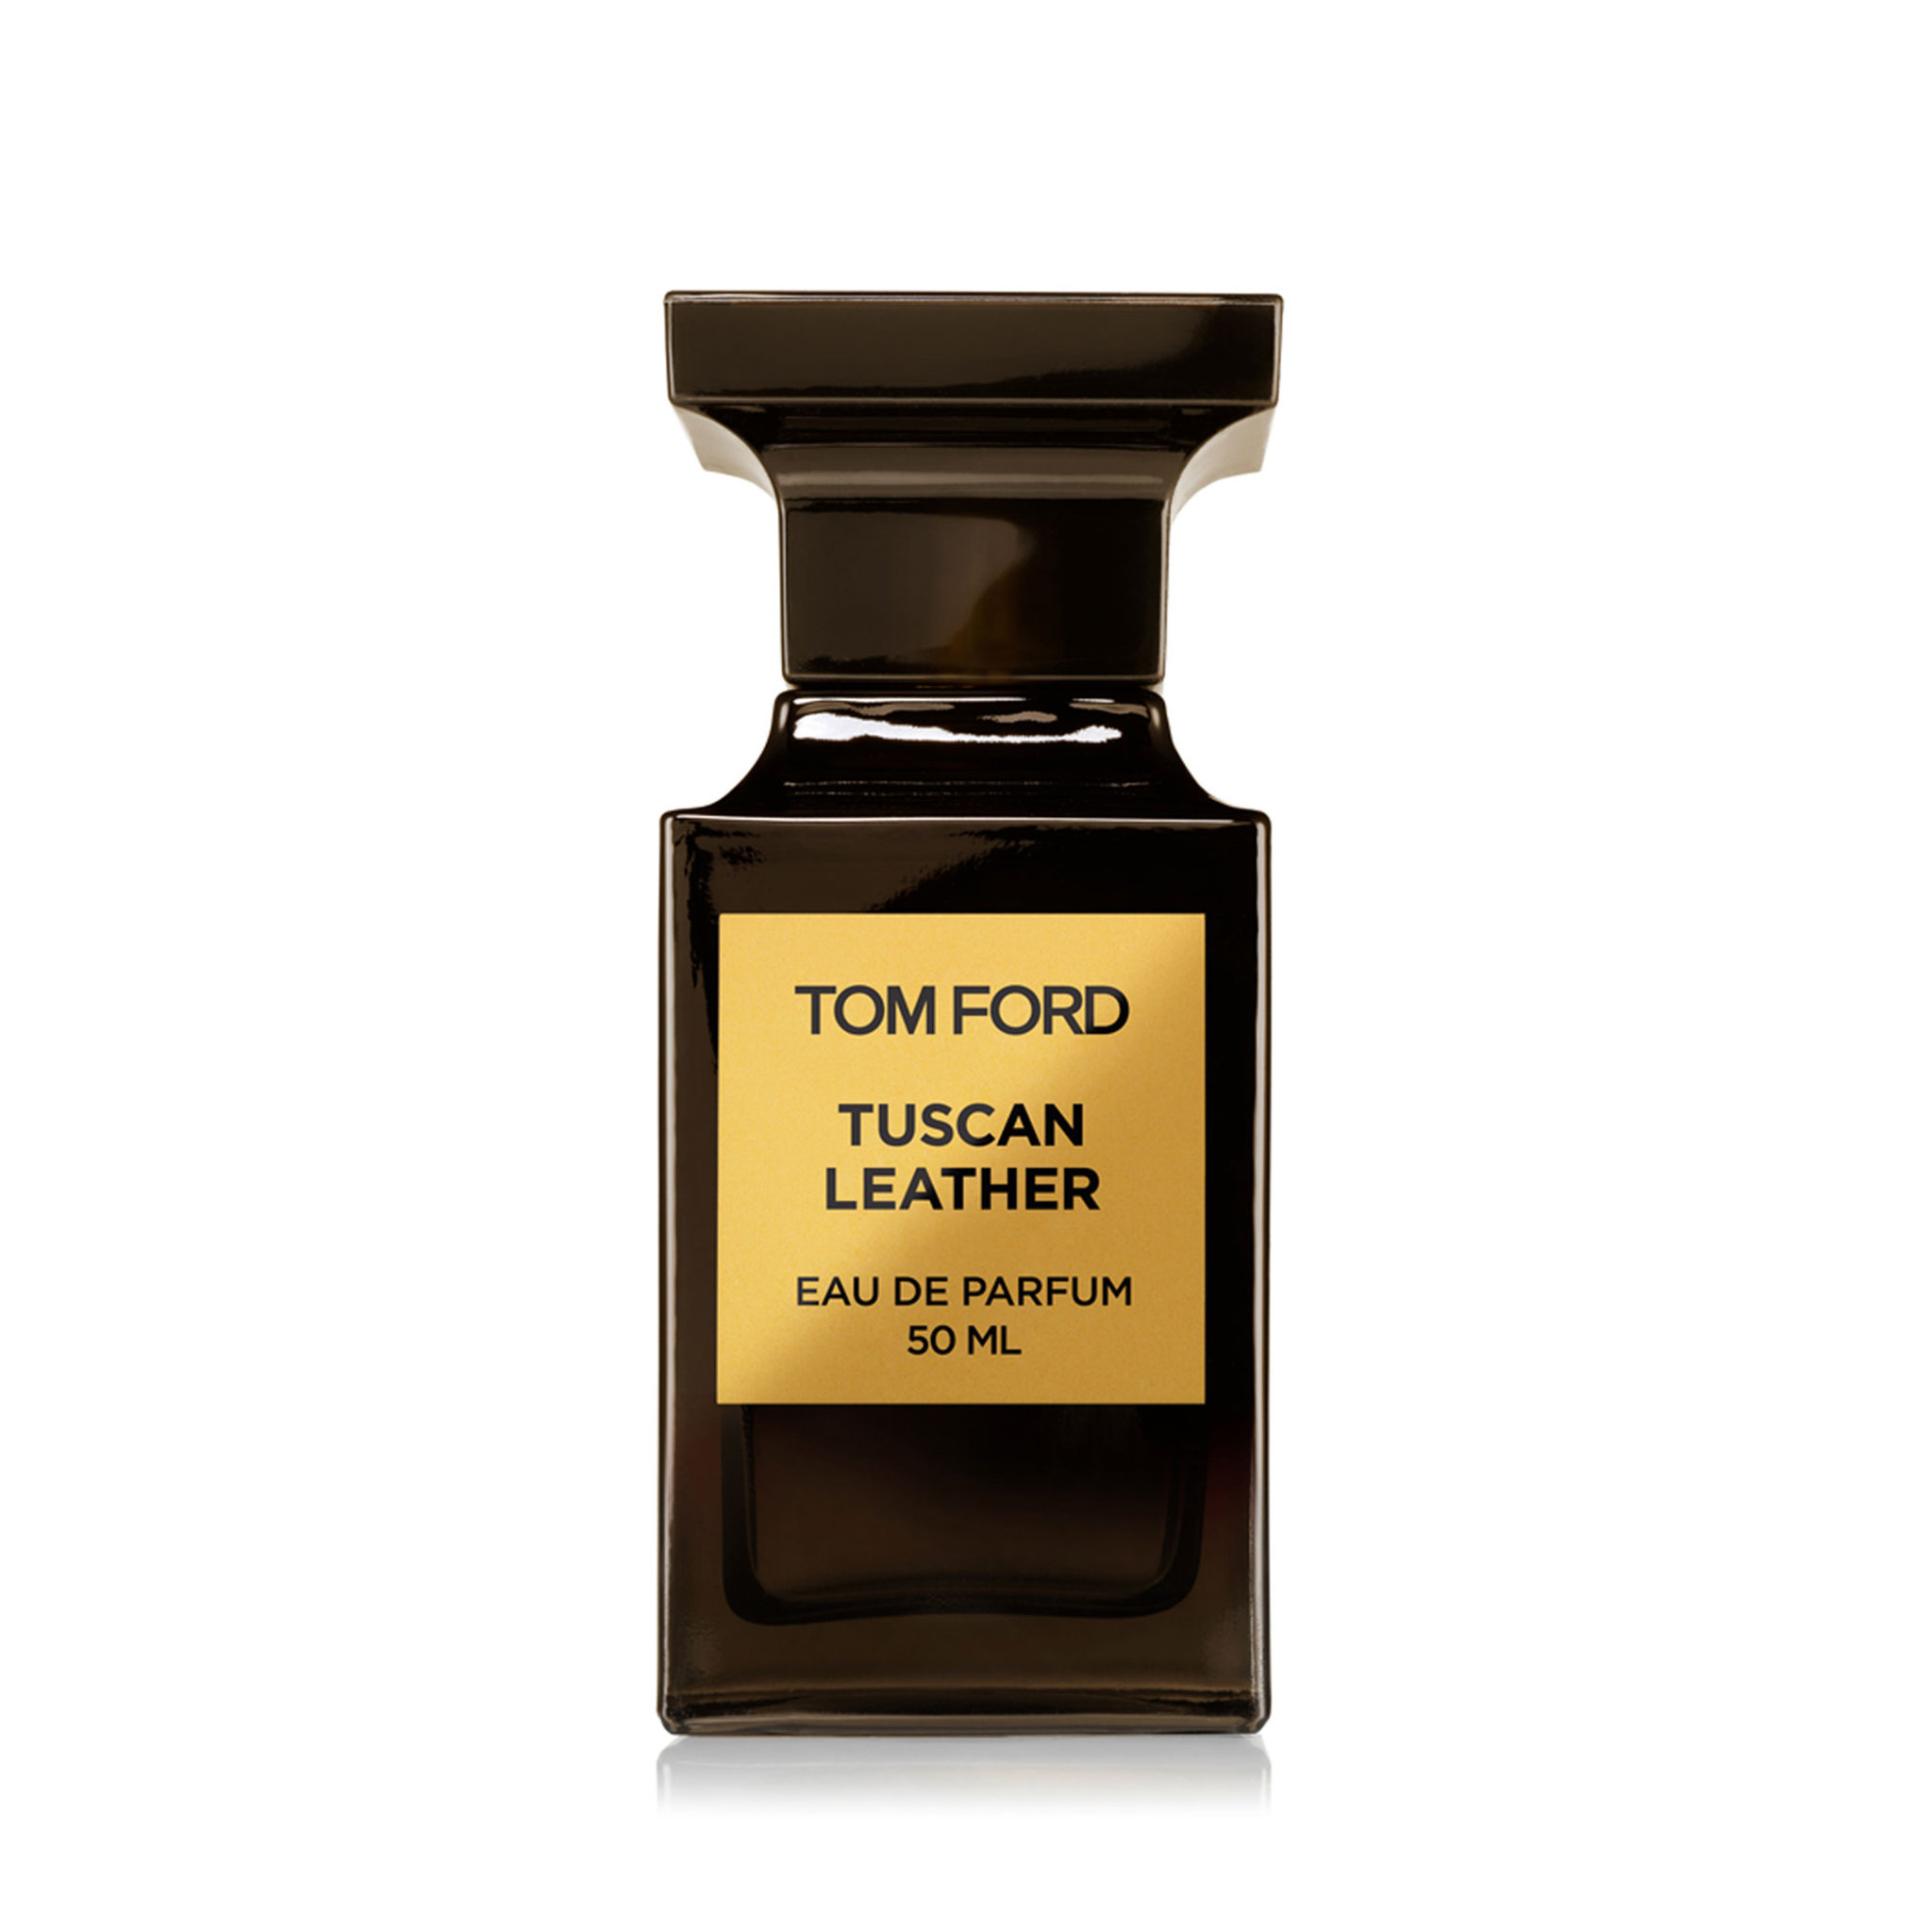 Tuscan Leather EdP